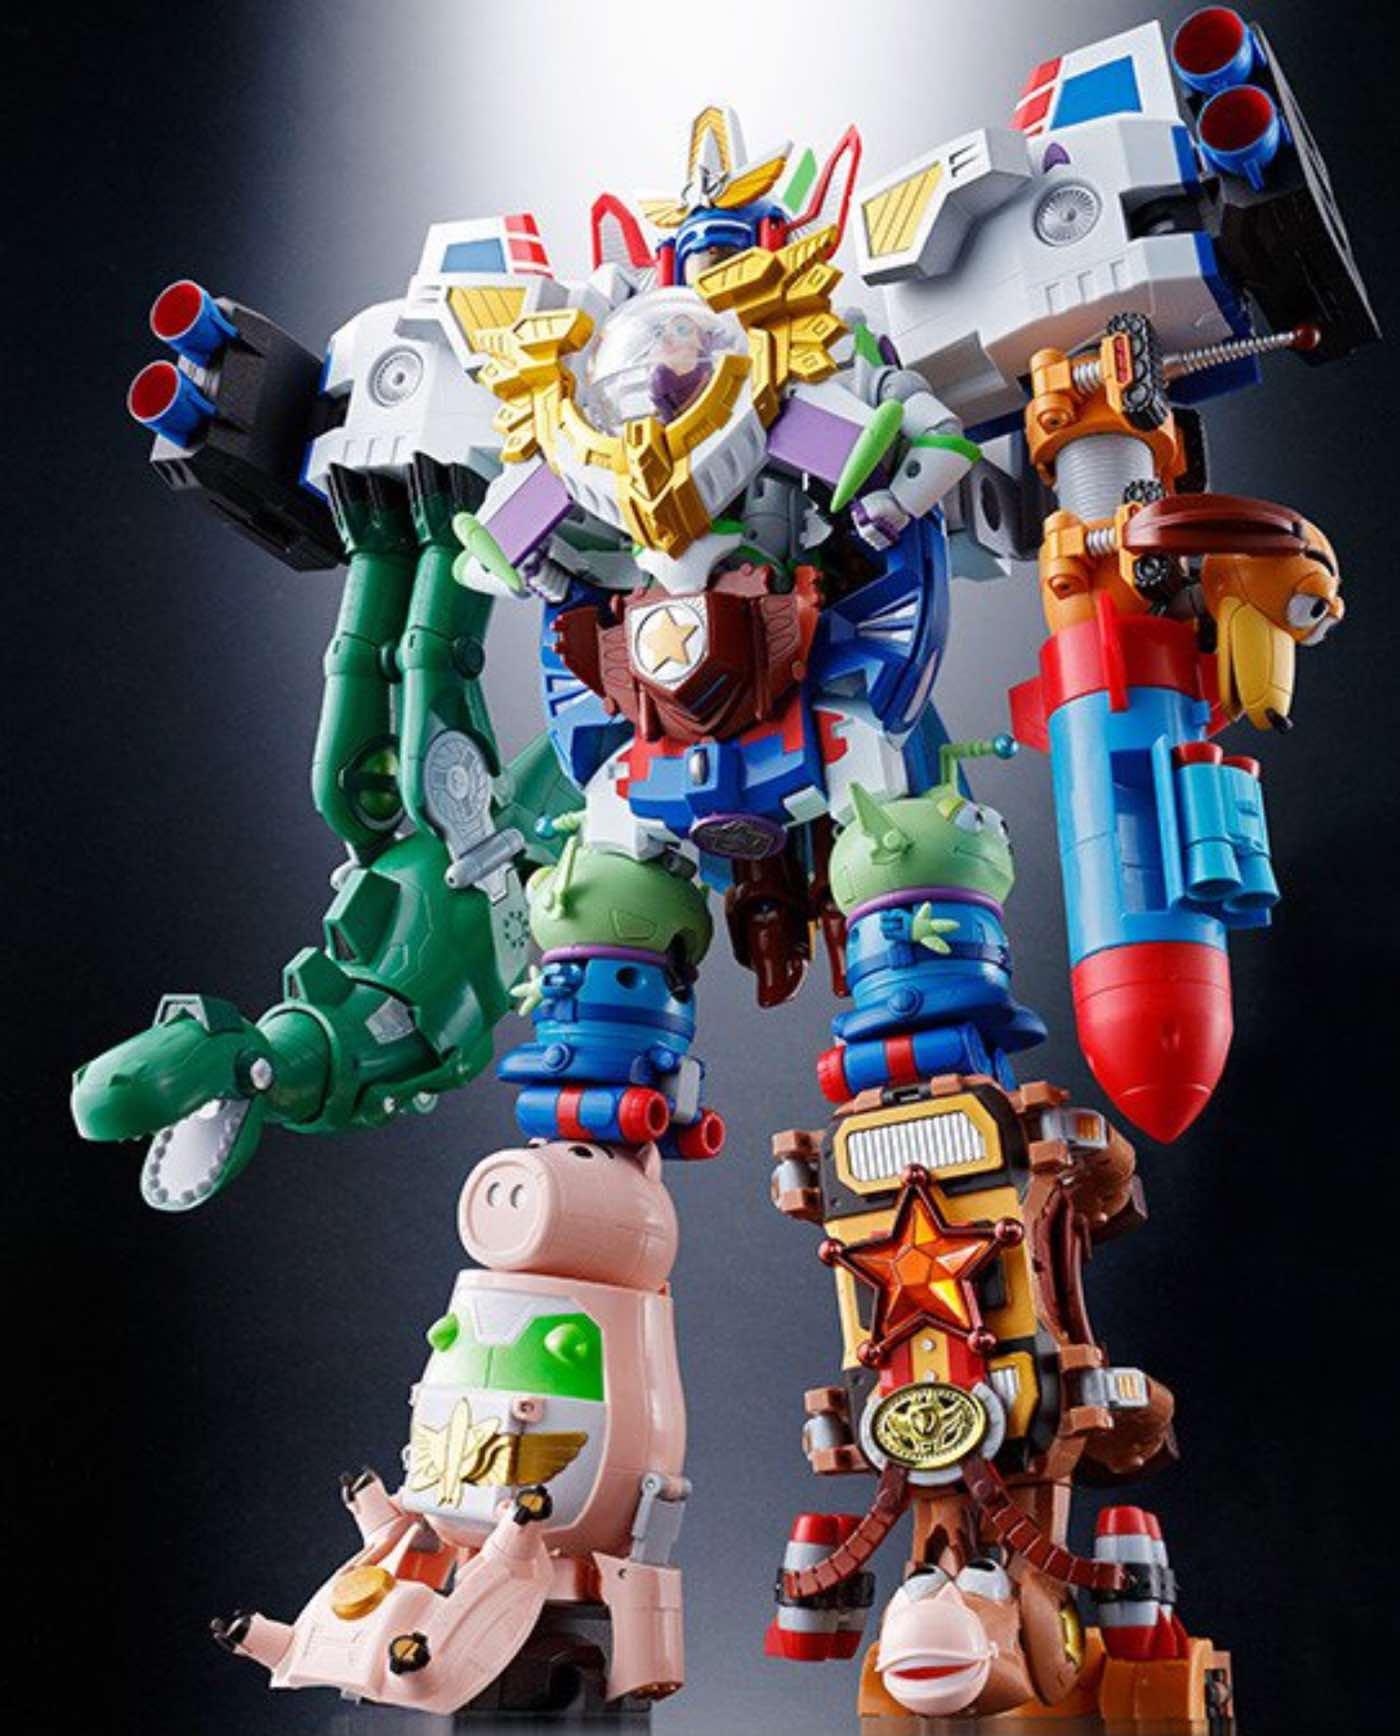 disney-bandai-toy-story-chogokin-mecha-toys-super-combination-gangreat-king